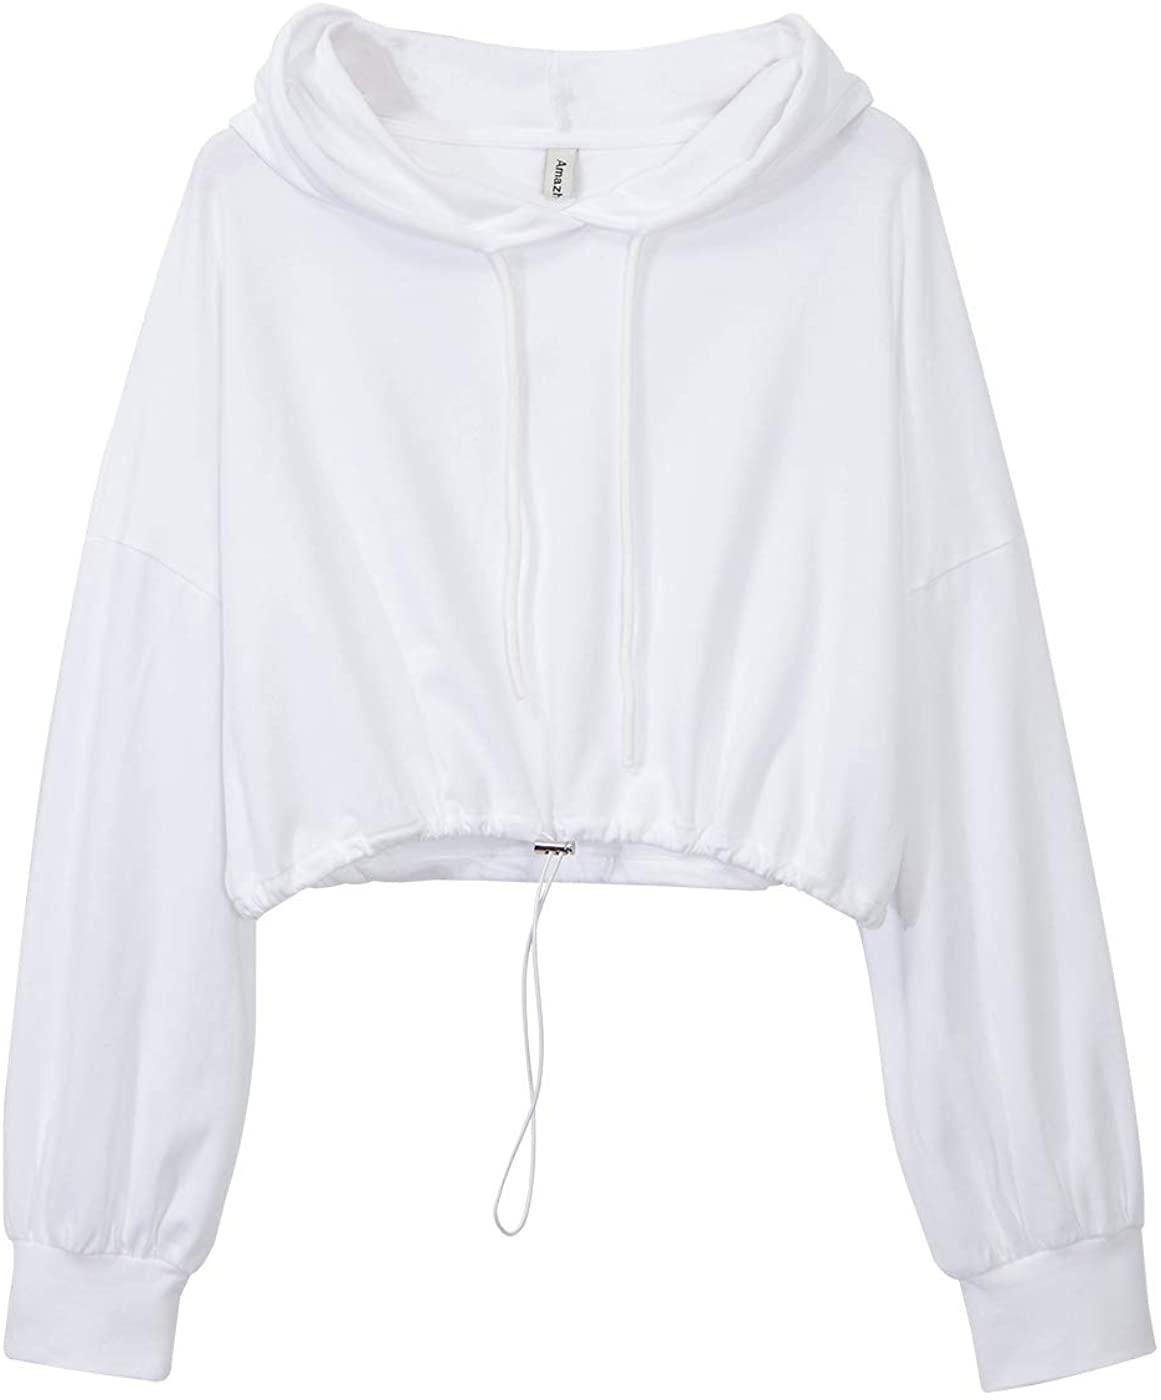 Amazhiyu Womens Cropped Hoodies Long Sleeve Drawstring Pullover Hooded Sweatshirt Casual Loose Crop Top